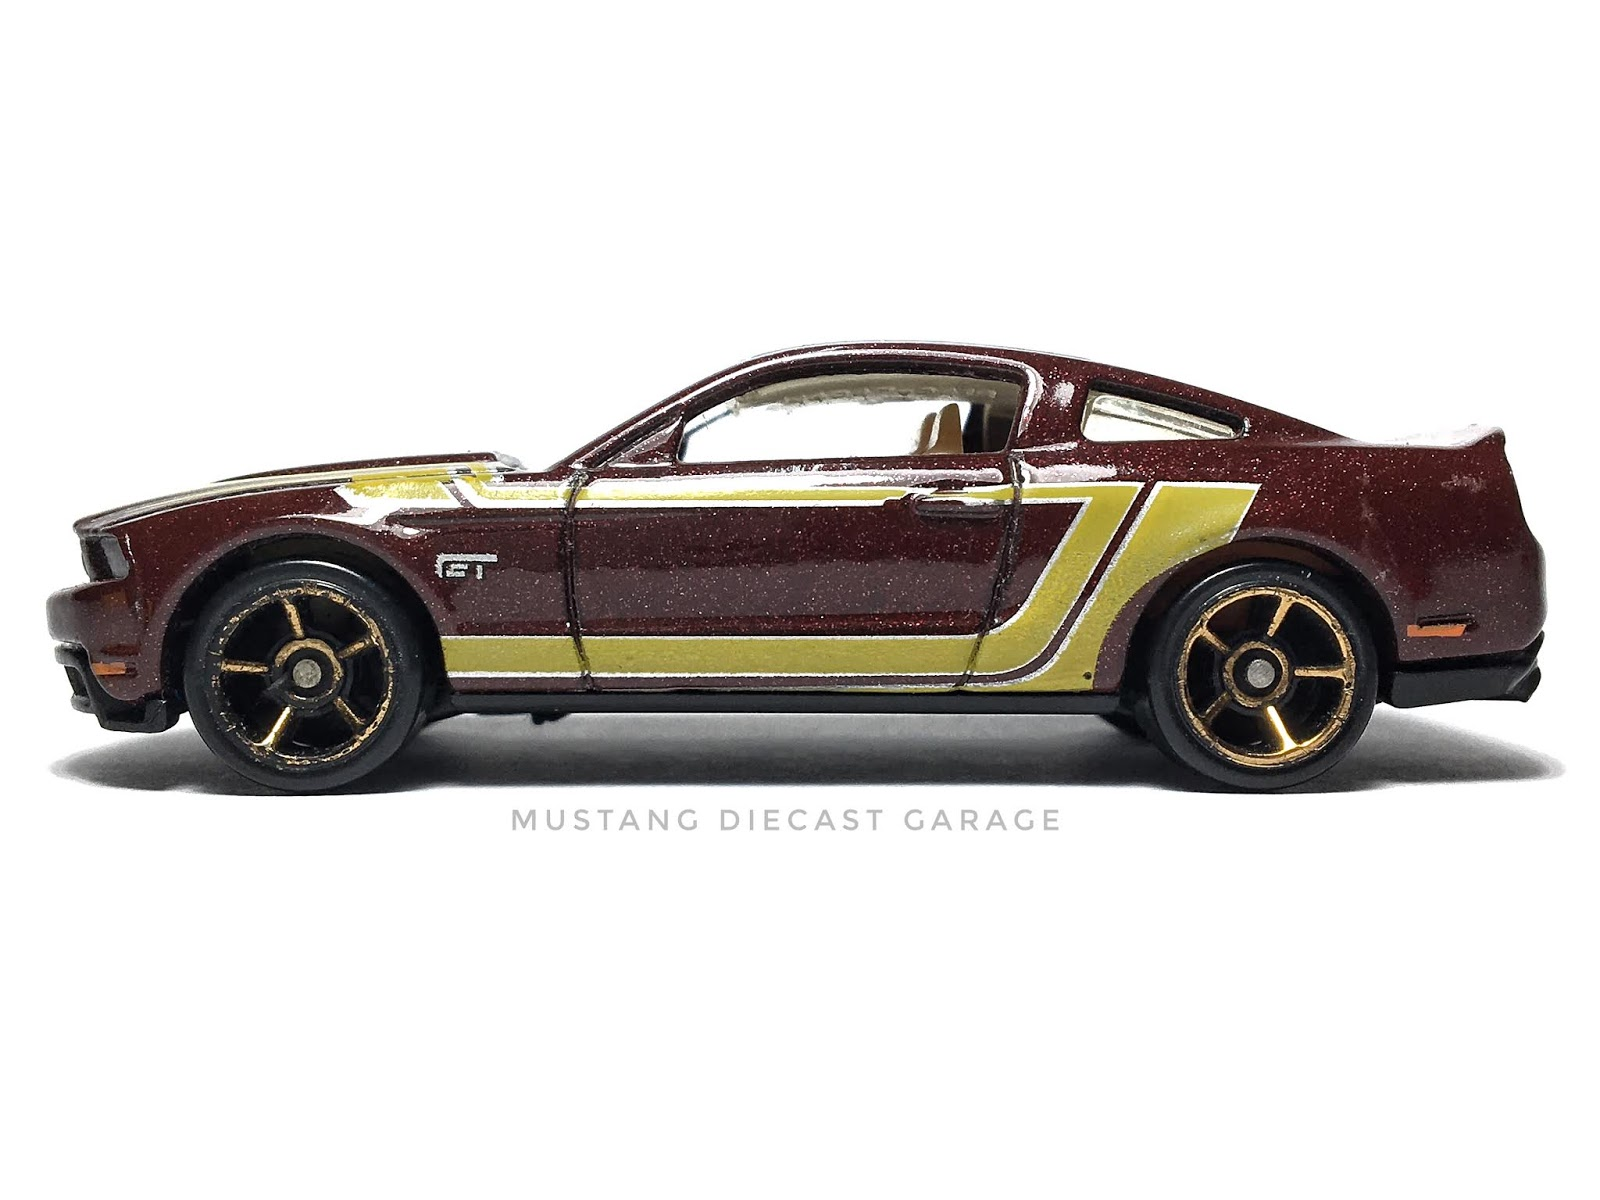 Hot Wheels 2010 Ford Mustang GT Series 2011 Faster Than Ever  (สีเลือดหมู)(ล้อ FTE ไม่มีลายคาดที่กระจกหน้ารถ) 1:64